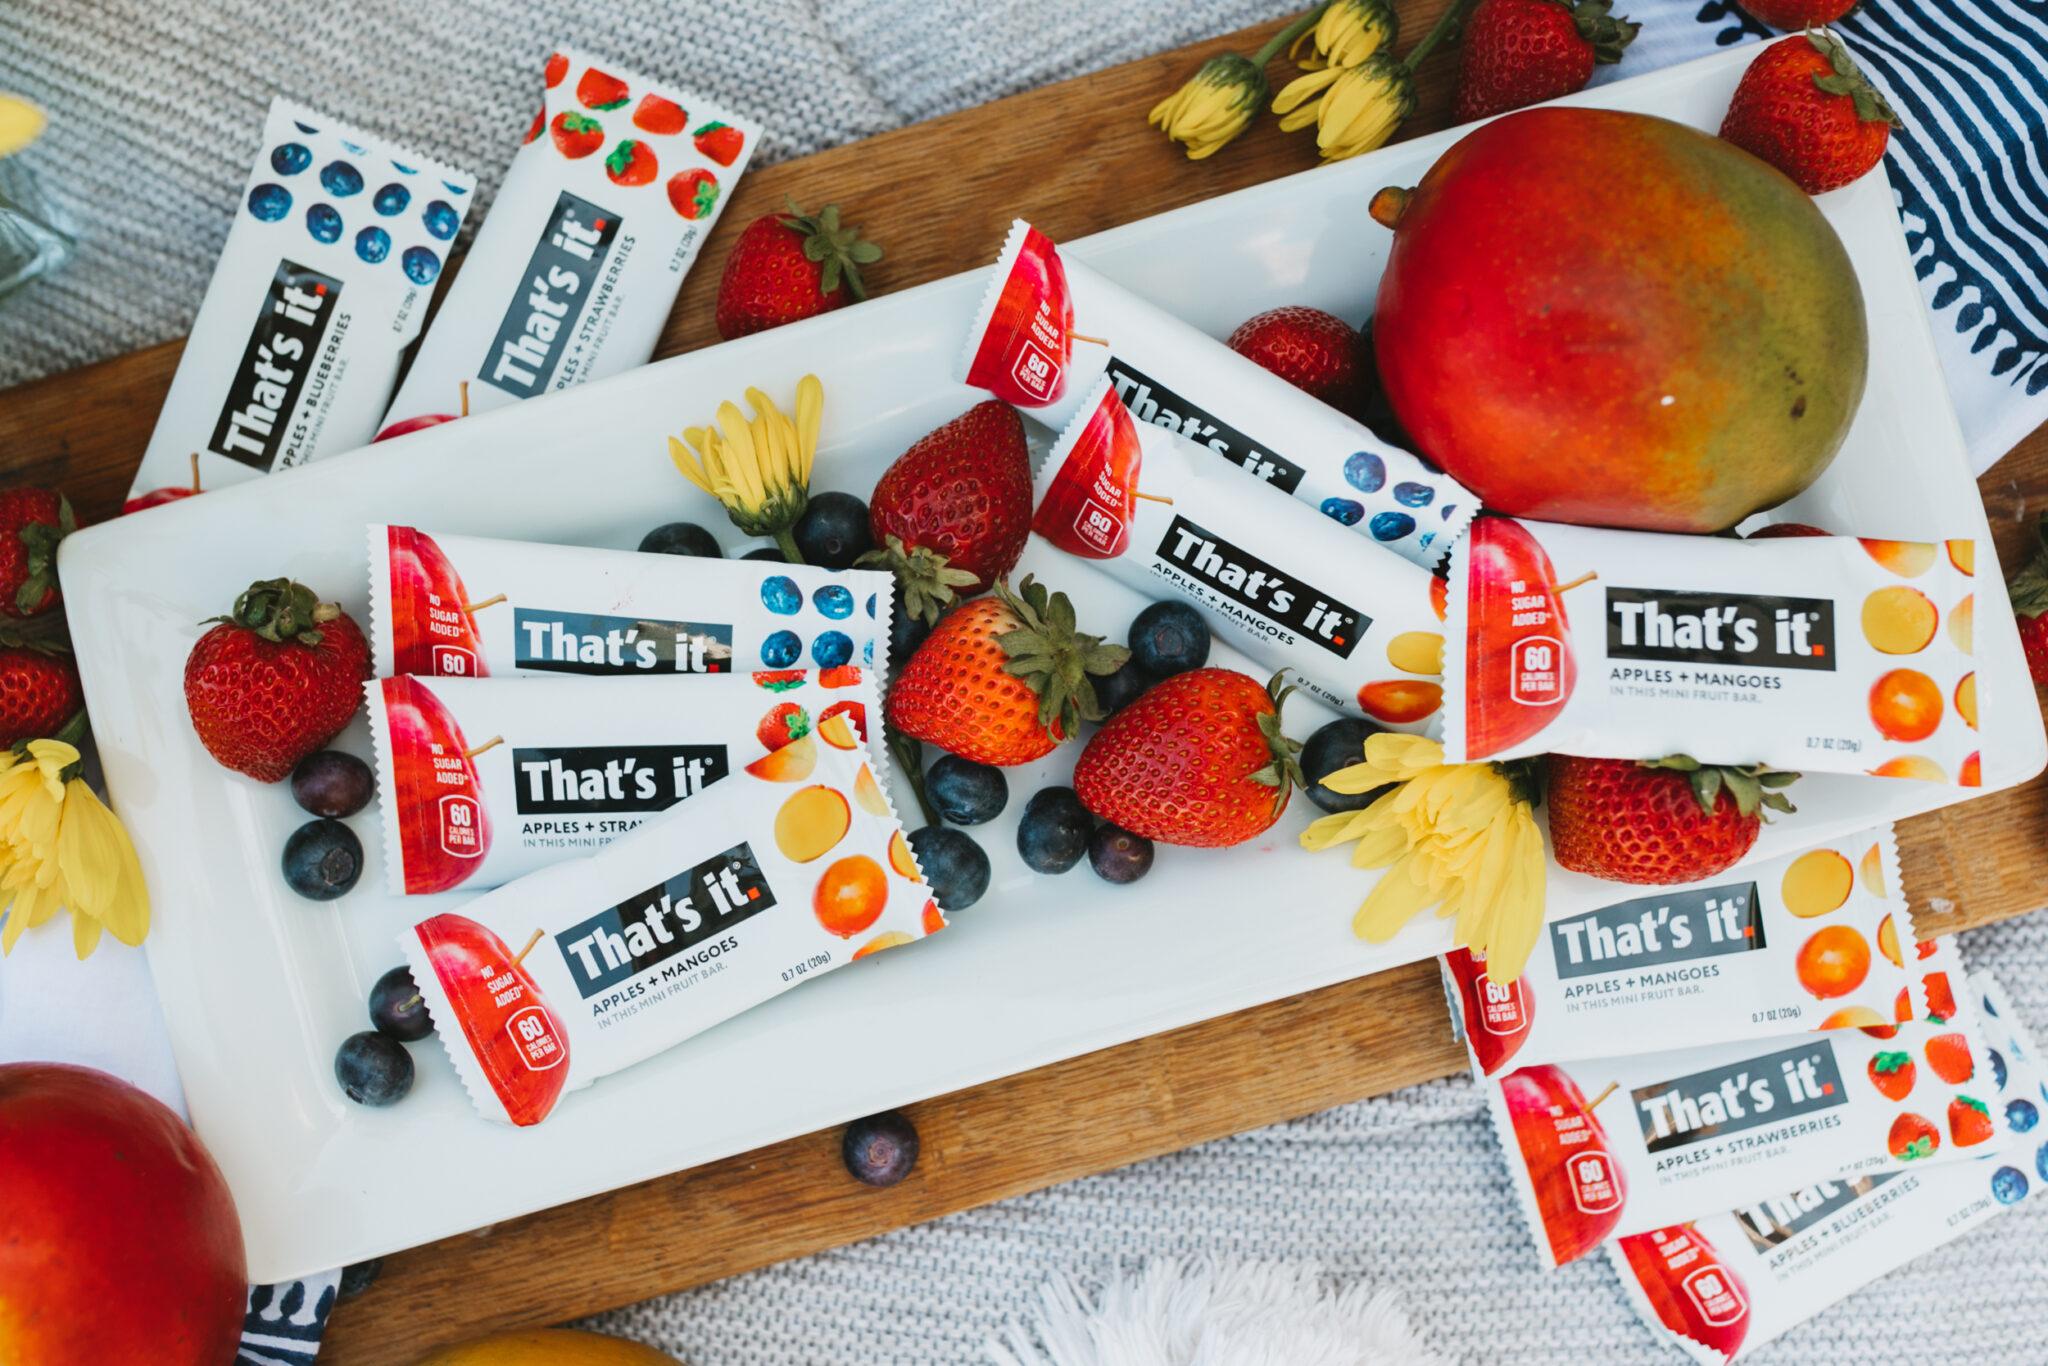 fruit snacks and fresh fruit